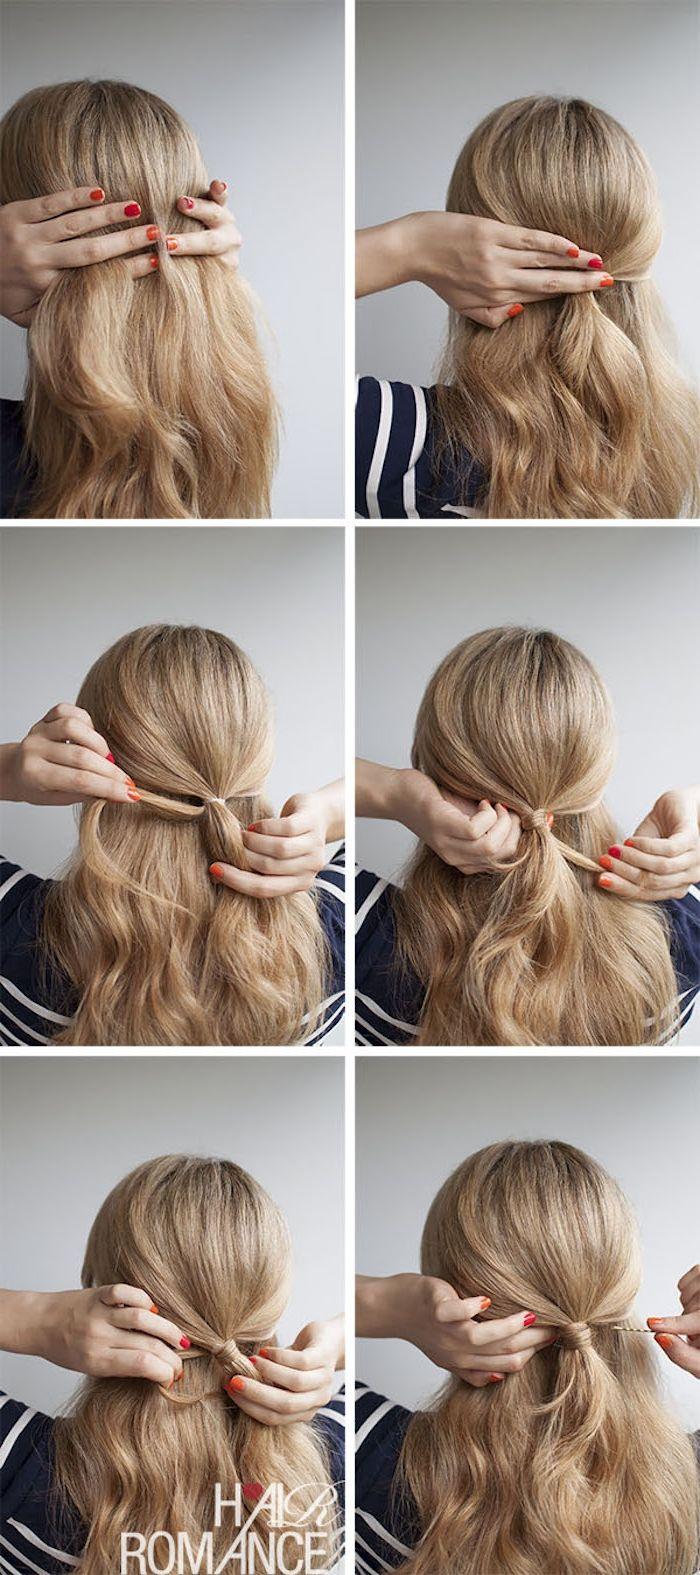 1001 Frisuren Fur Dunnes Haar Frisuren Fur Feines Haar Schnitte Volumentricks Styling Frisuren Glatte Haare Frisuren Dunnes Haar Frisuren Offene Haare Glatt